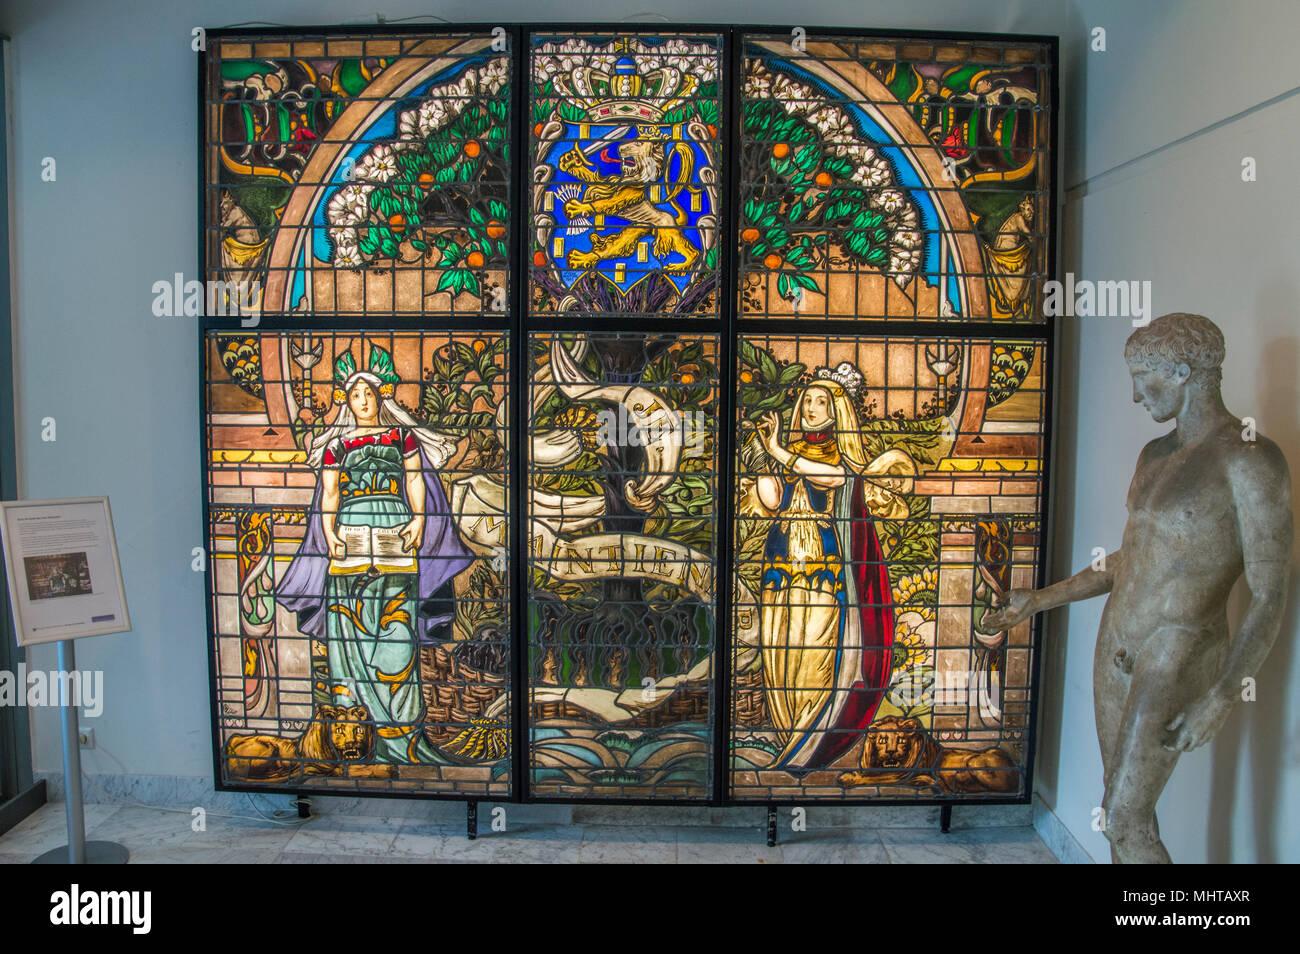 Glas In Lood Amsterdam.Jan Schouten Glas In Lood Stained Glass At The Allard